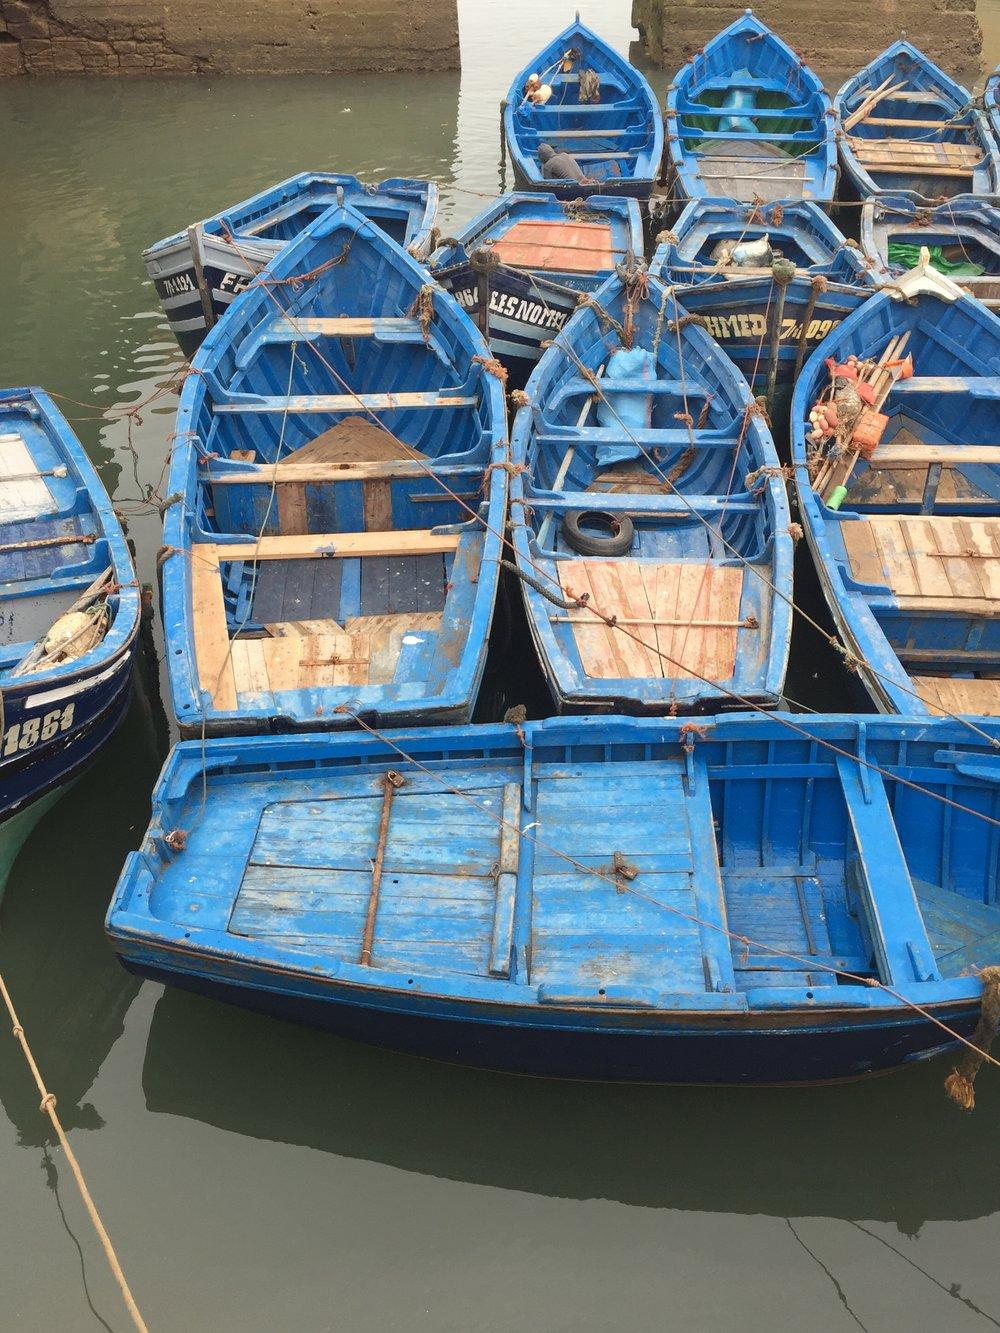 BoatsEssaouiraMorocco.JPG